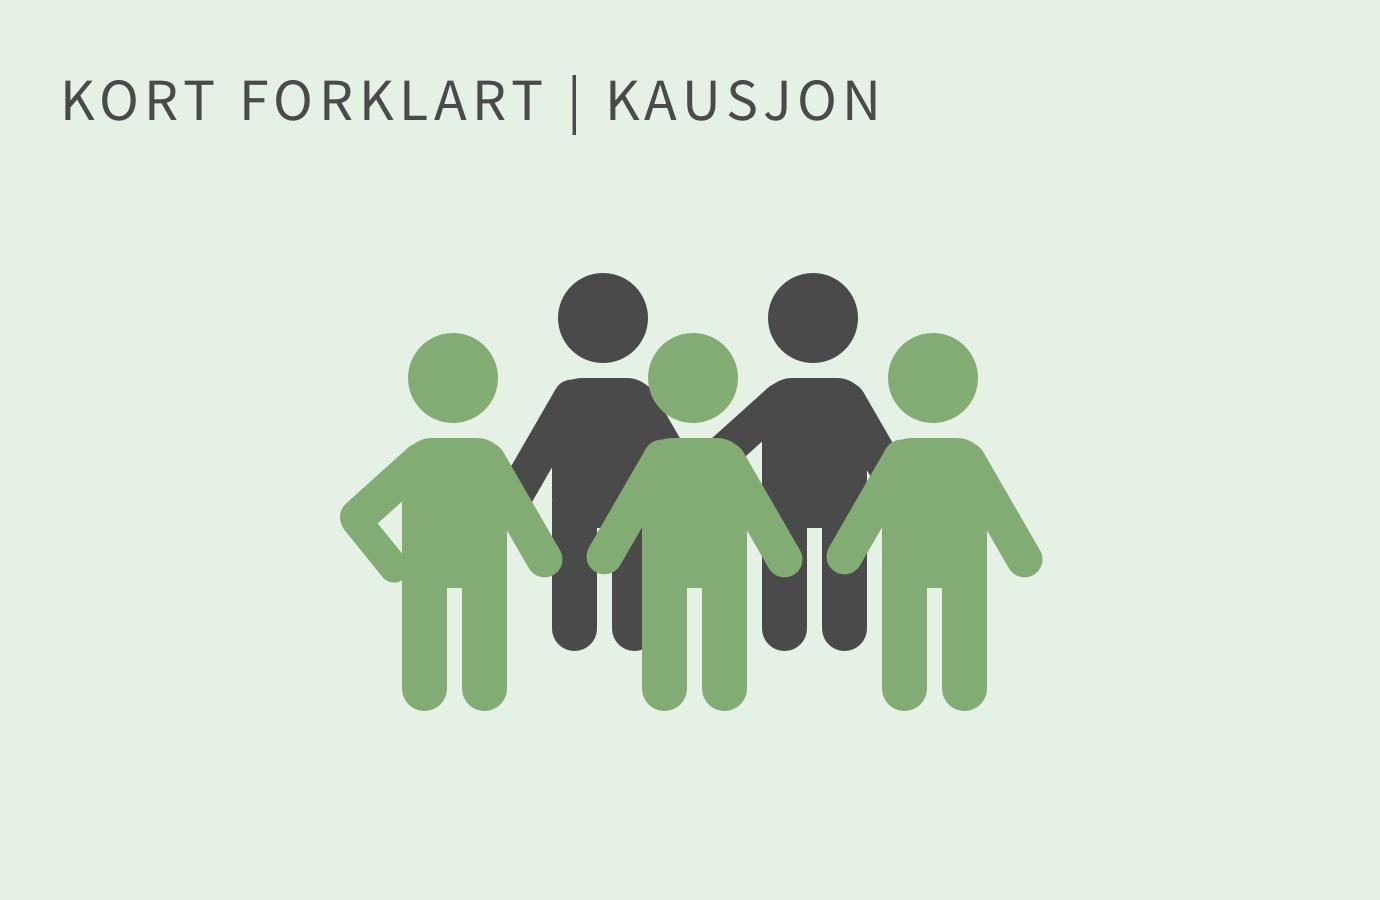 Startbilde_kausjonx3.png